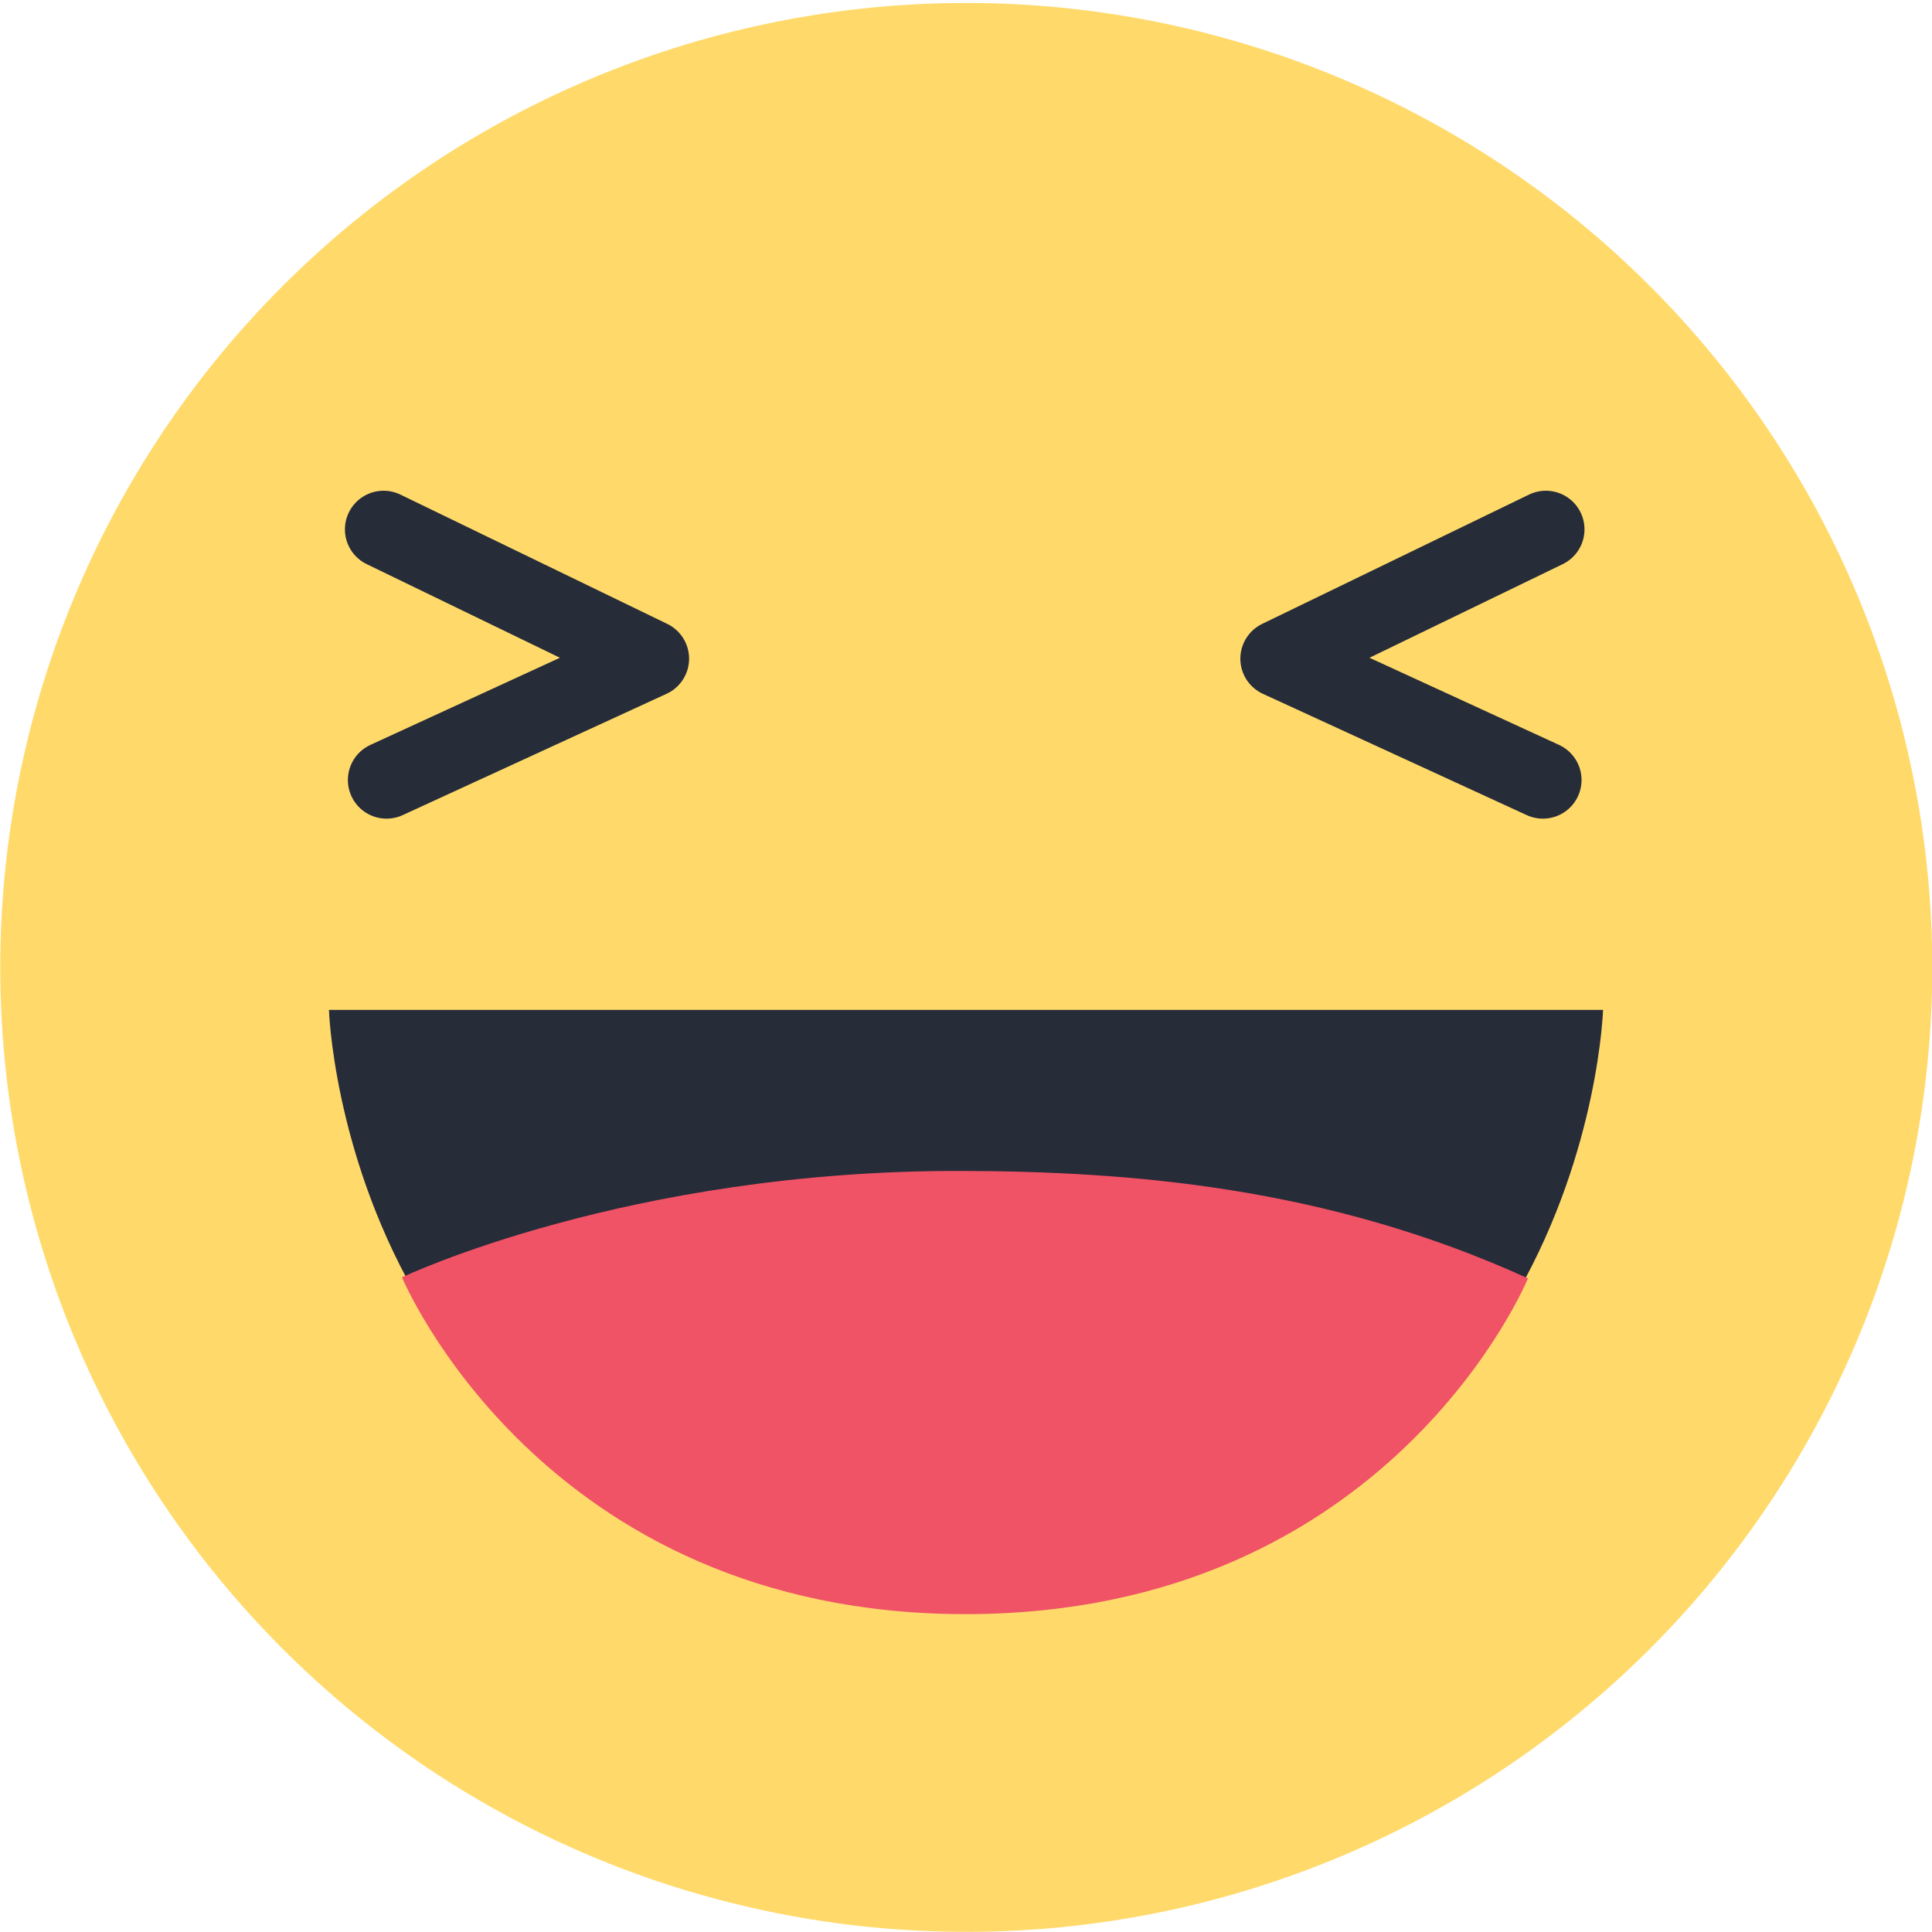 Emoji facebook clipart png royalty free library Facebook Haha Emoji Like Png Transparent Background png royalty free library